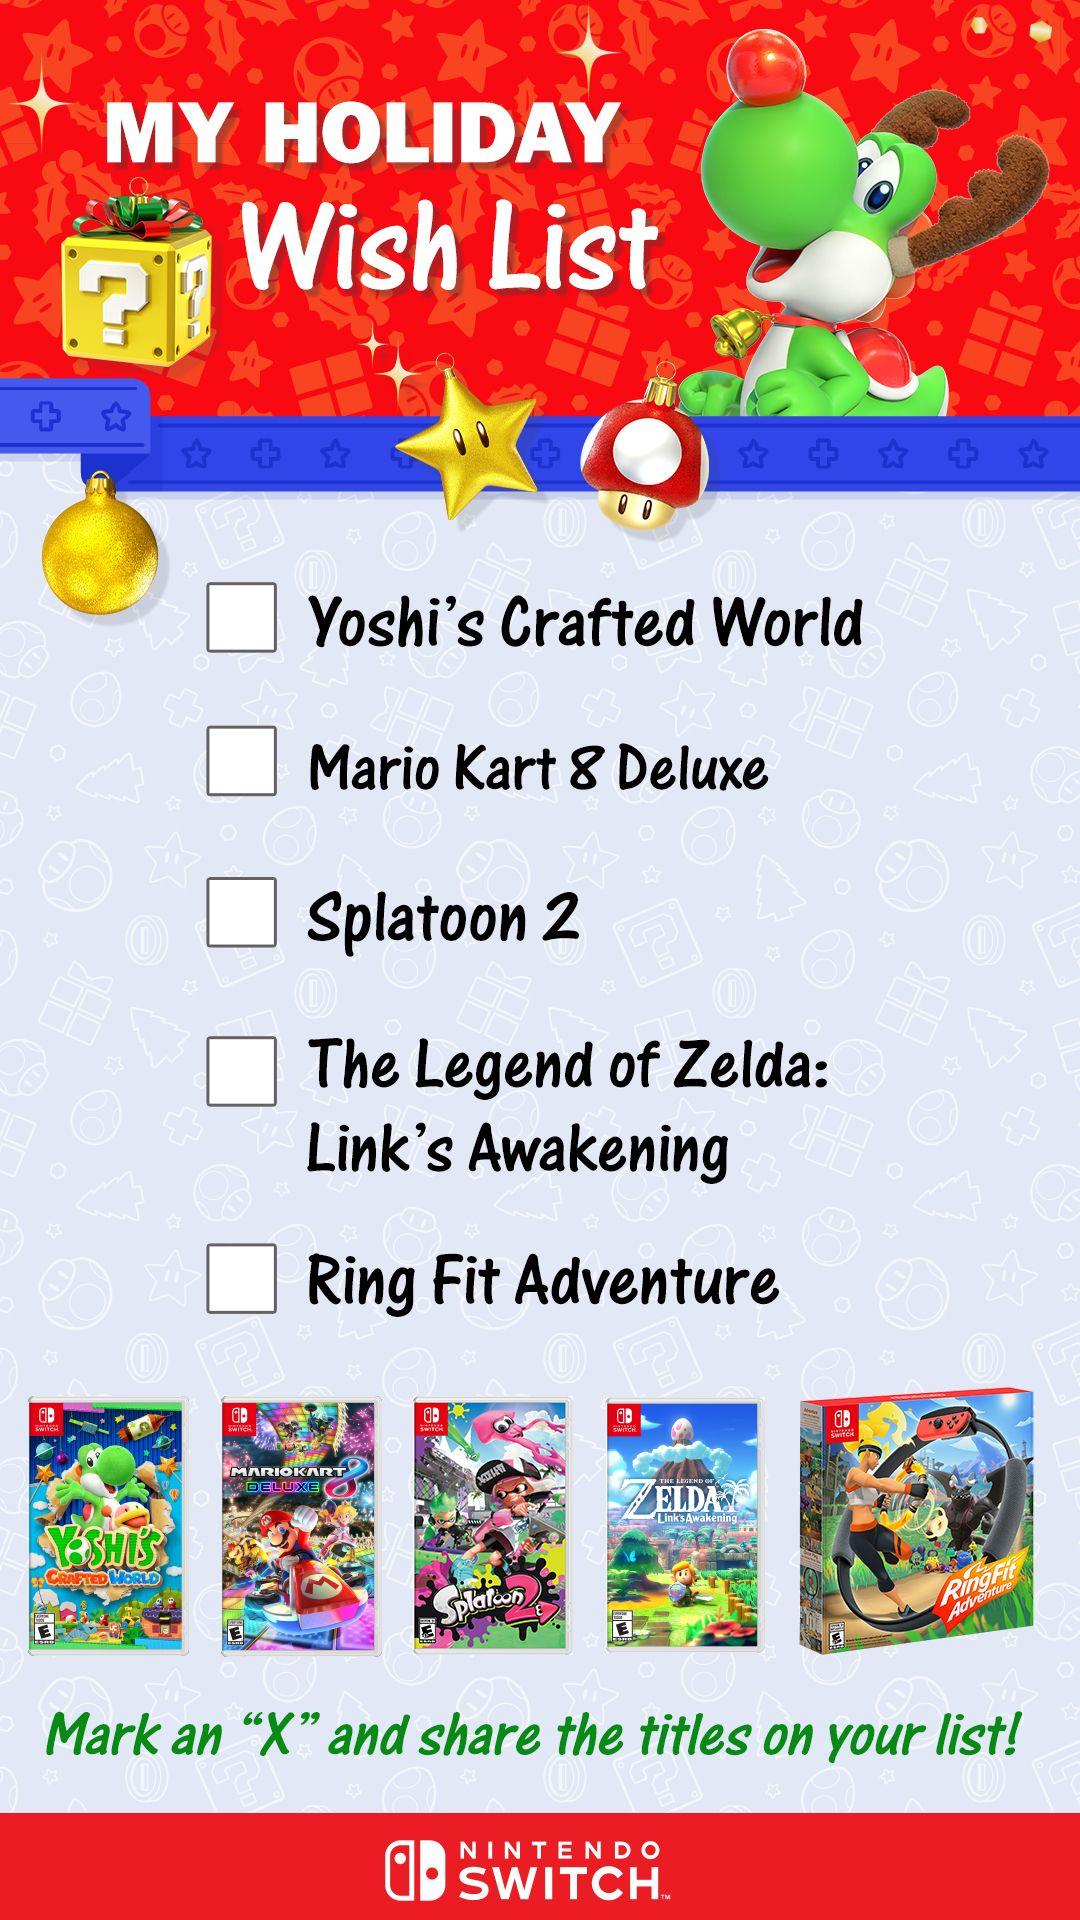 Nintendo Holiday Wish List 2 Holiday Wishes Nintendo Free Eshop Codes